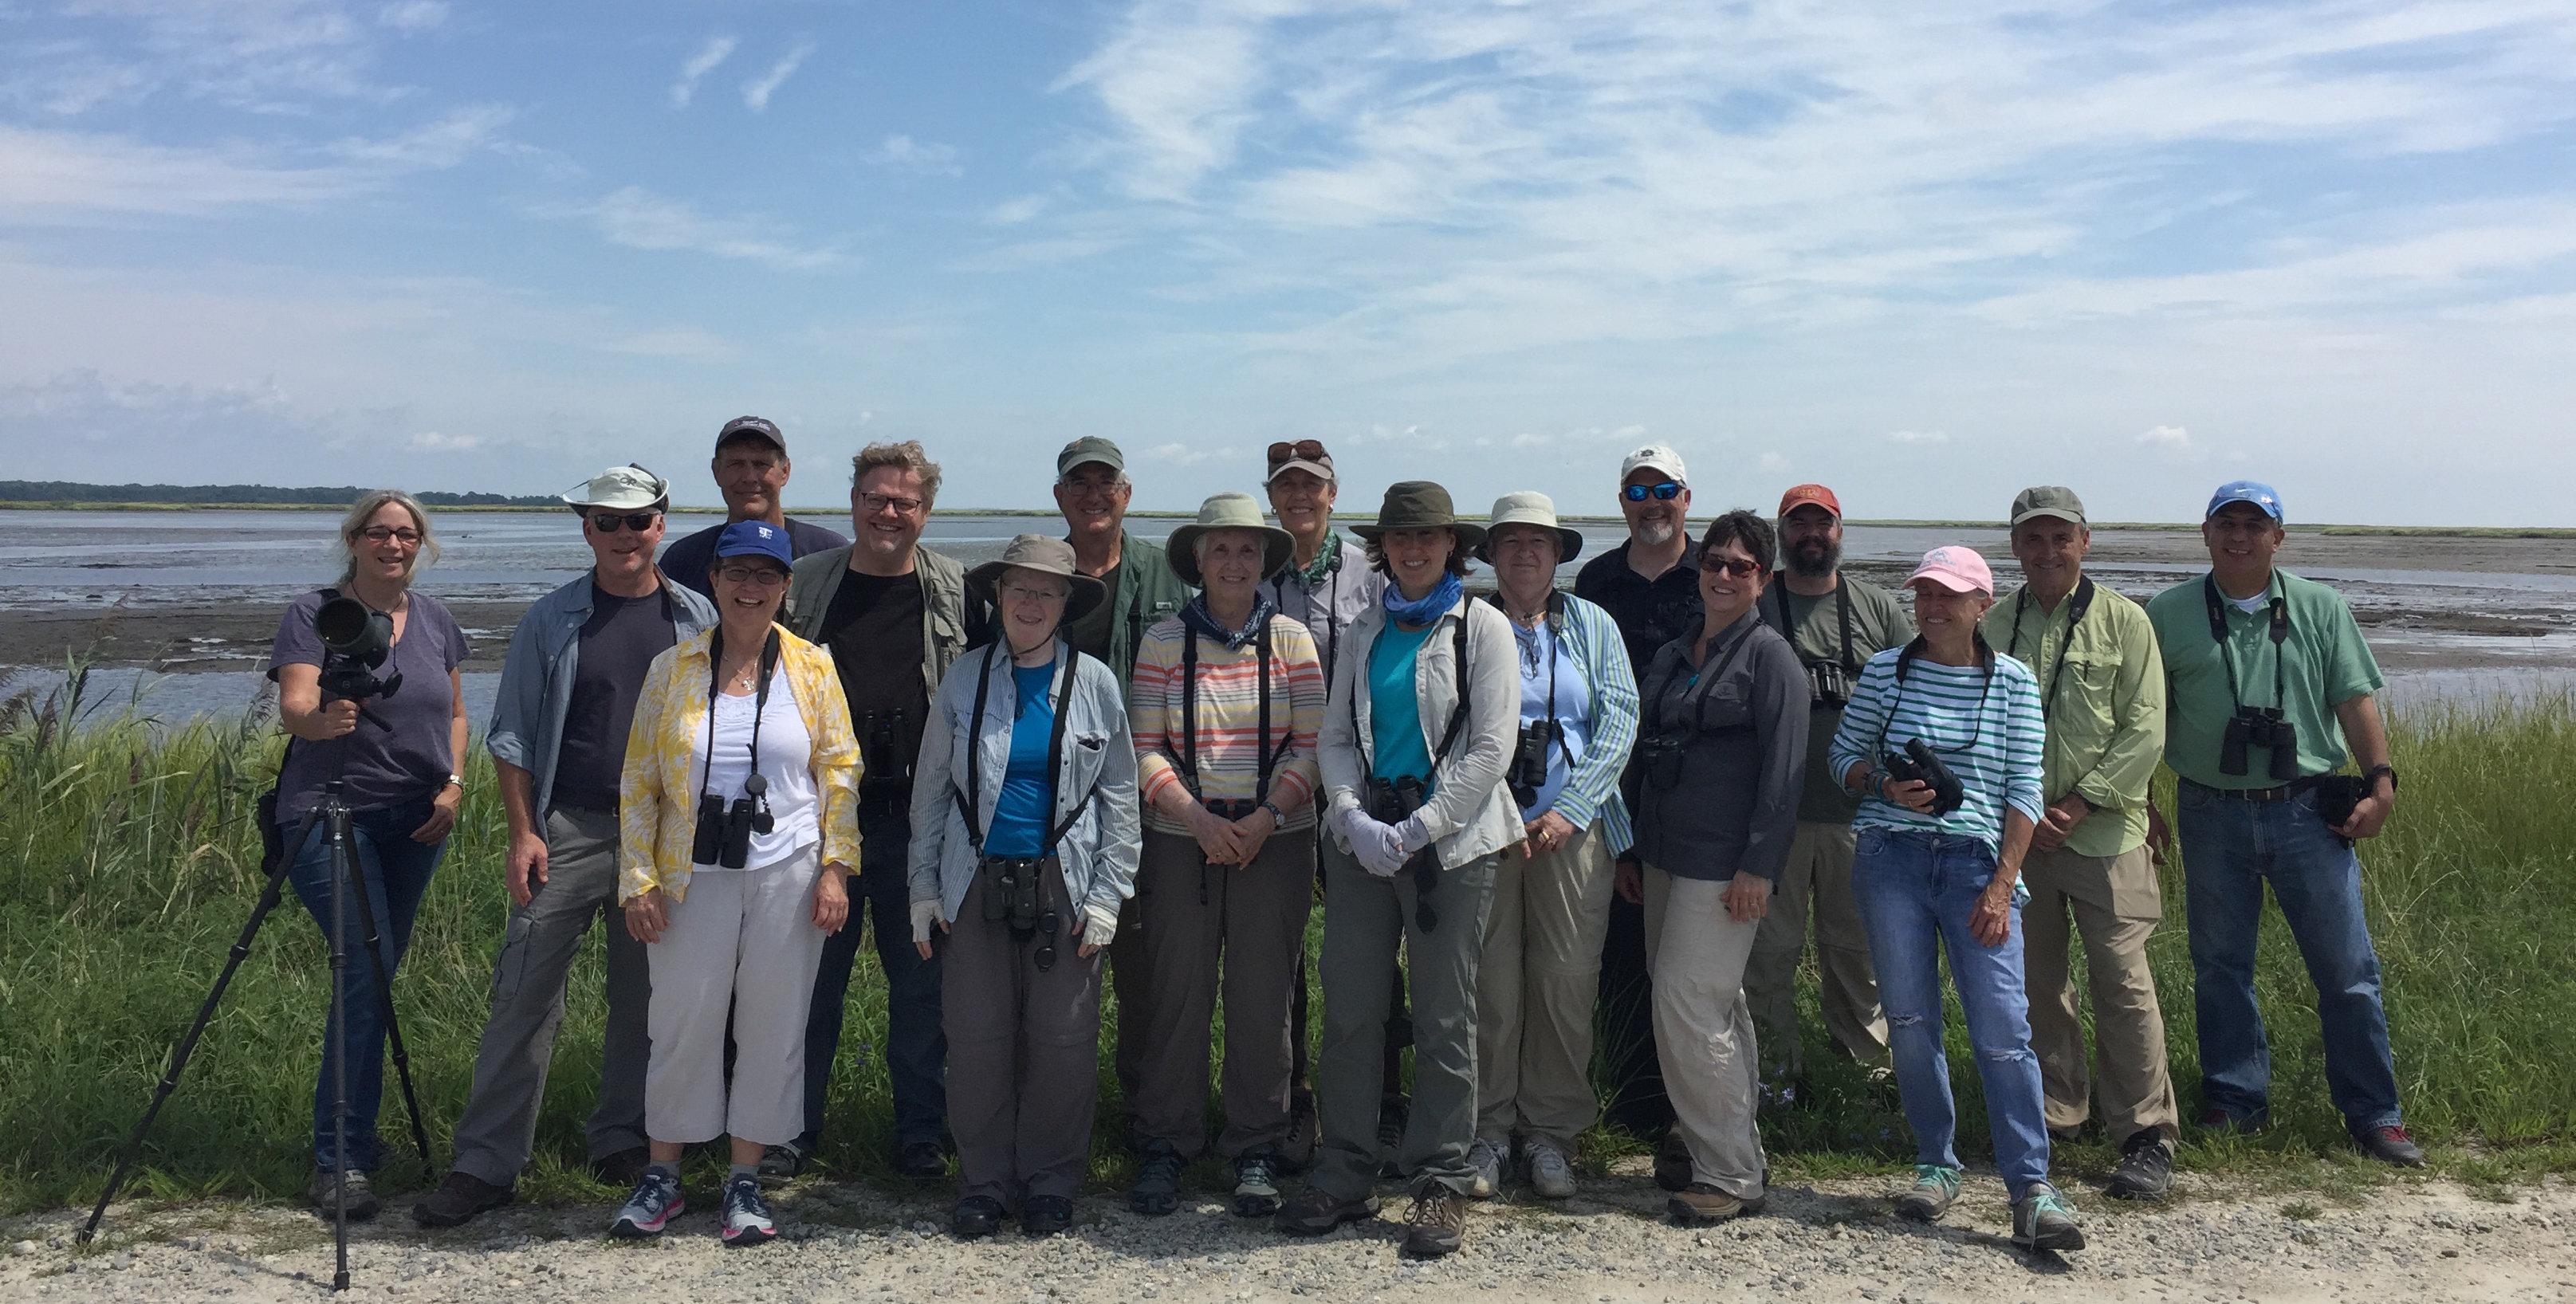 Shorebirds Class and Field Trip participants